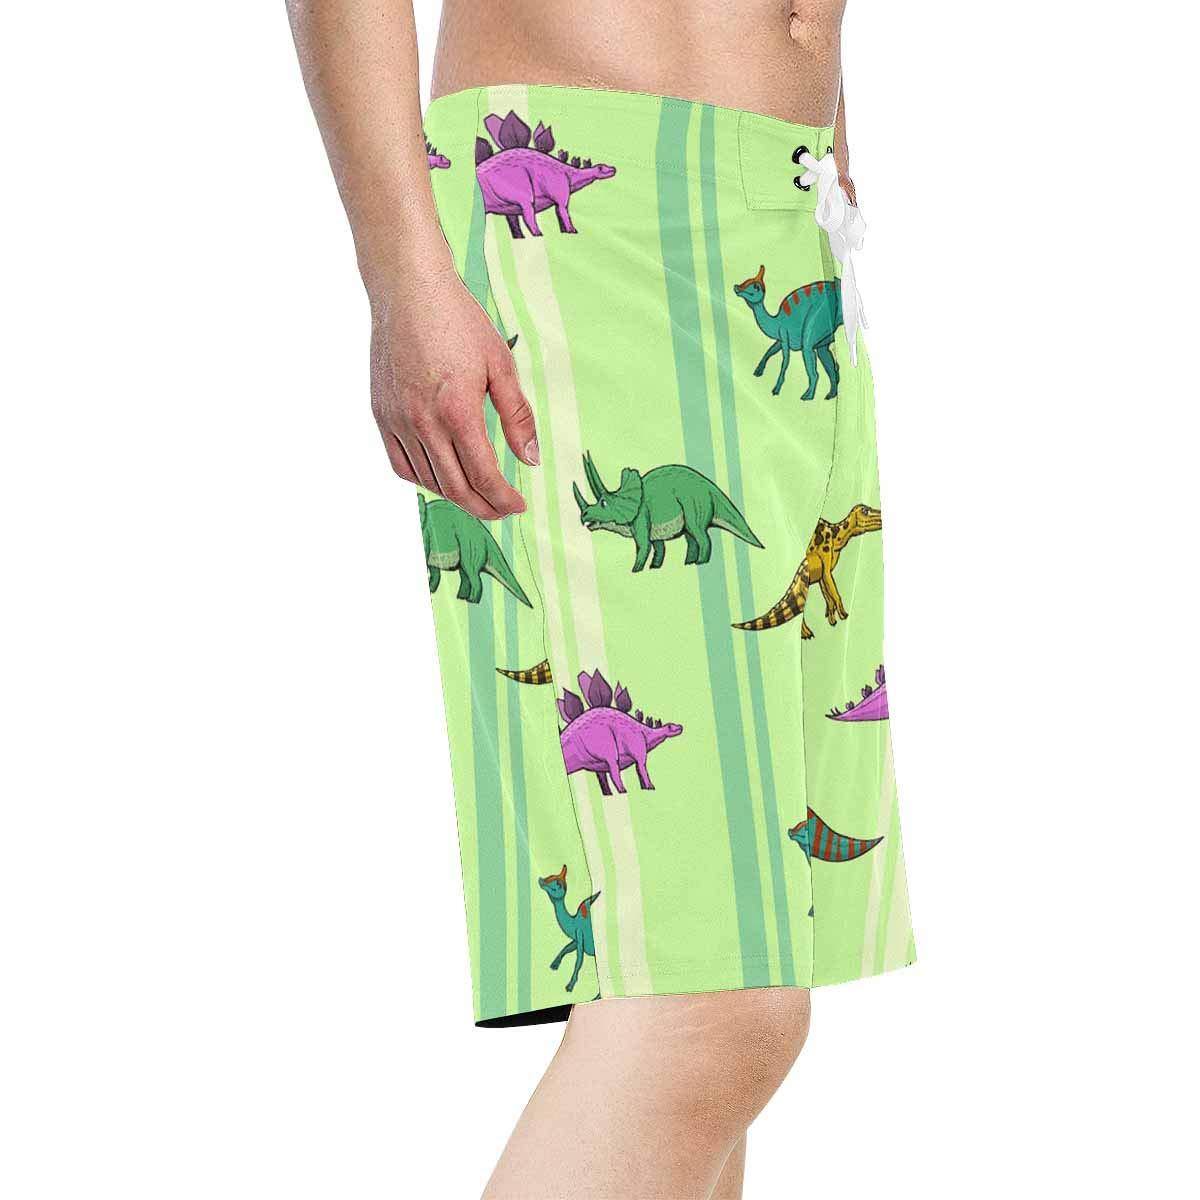 XS-6XL INTERESTPRINT Mens Beach Board Shorts Cute Dinosaur Green Quick Dry Swim Trunks